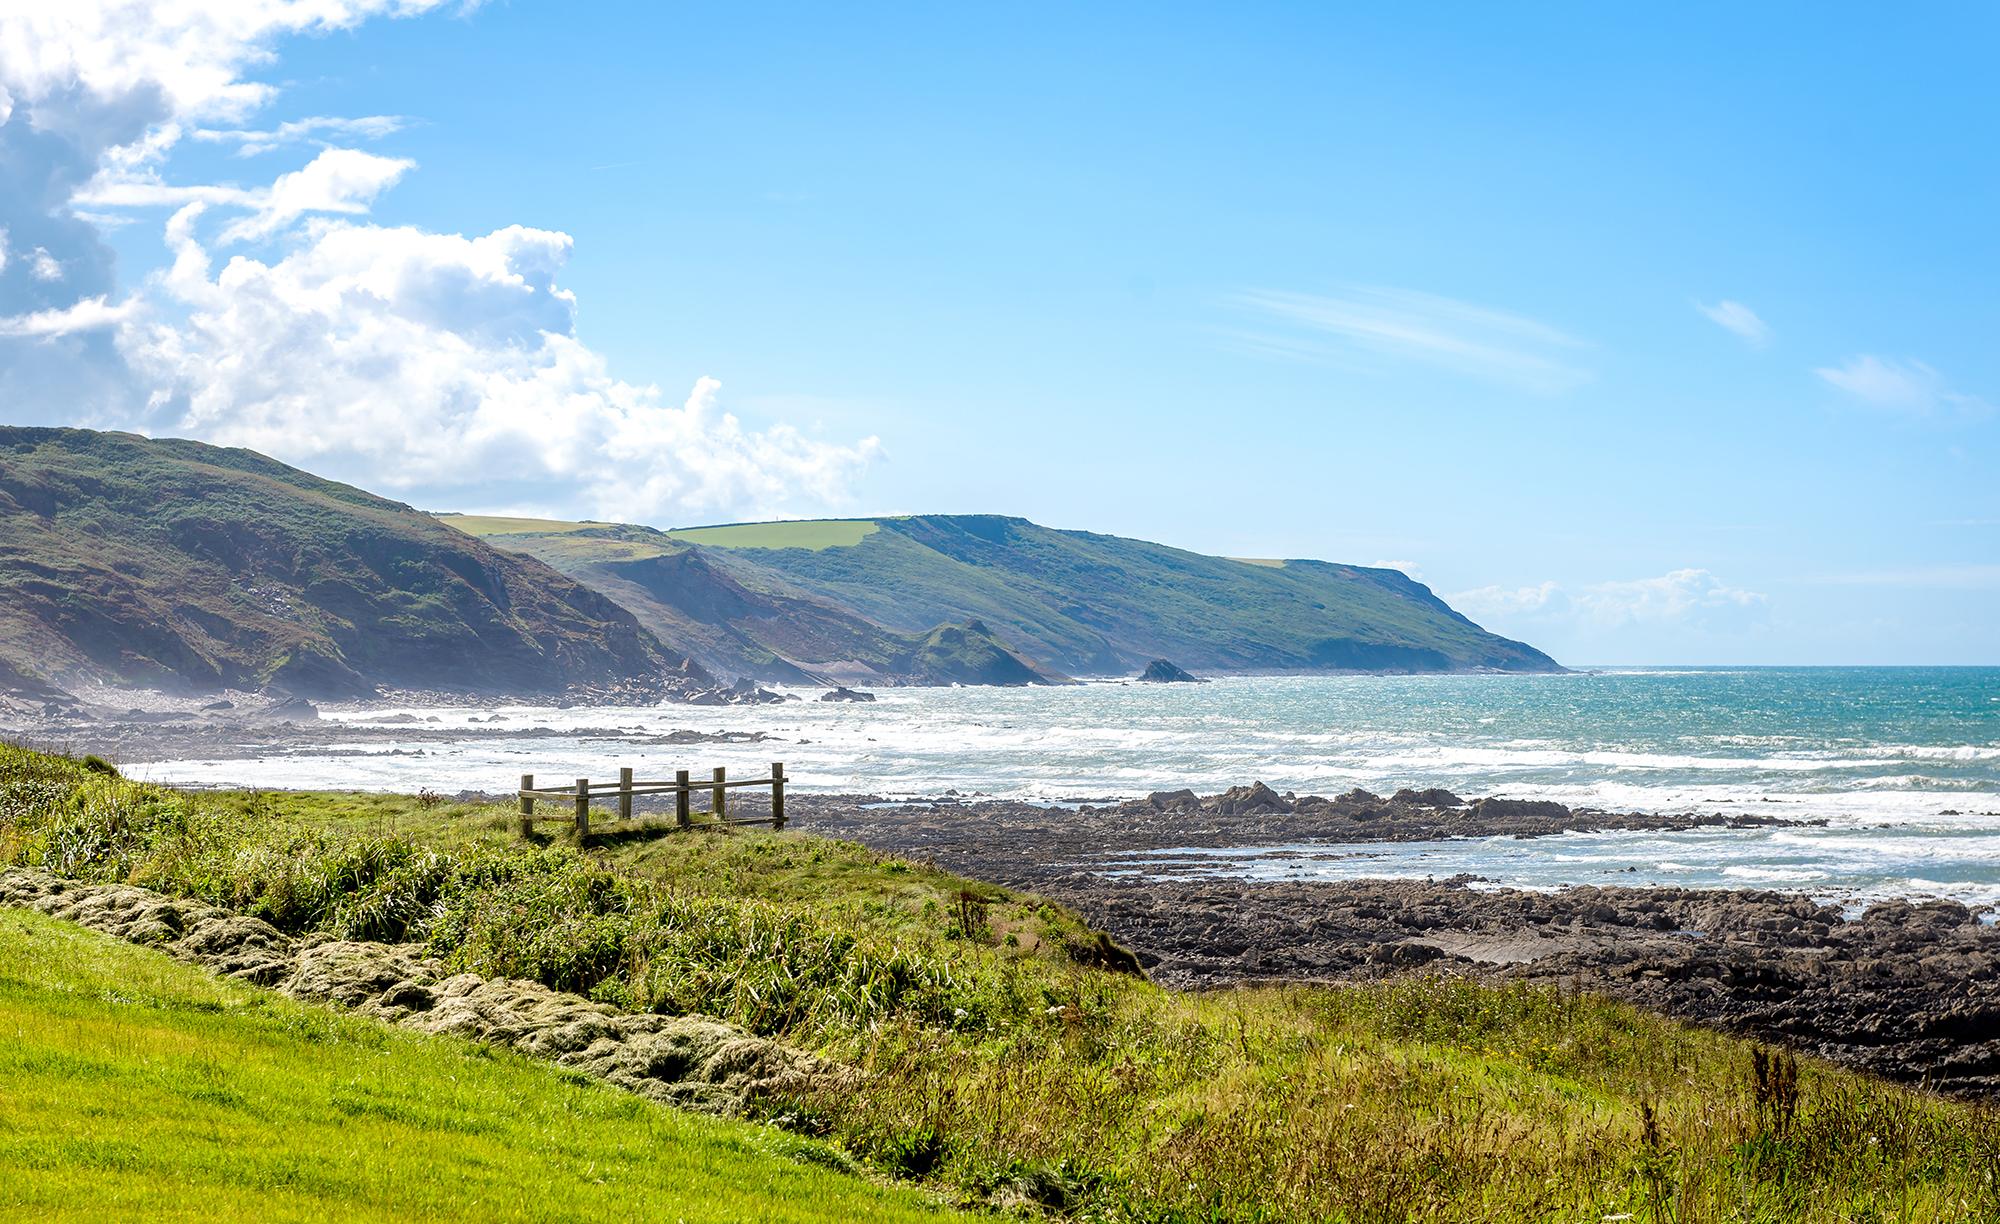 Beach Retreats – Read More